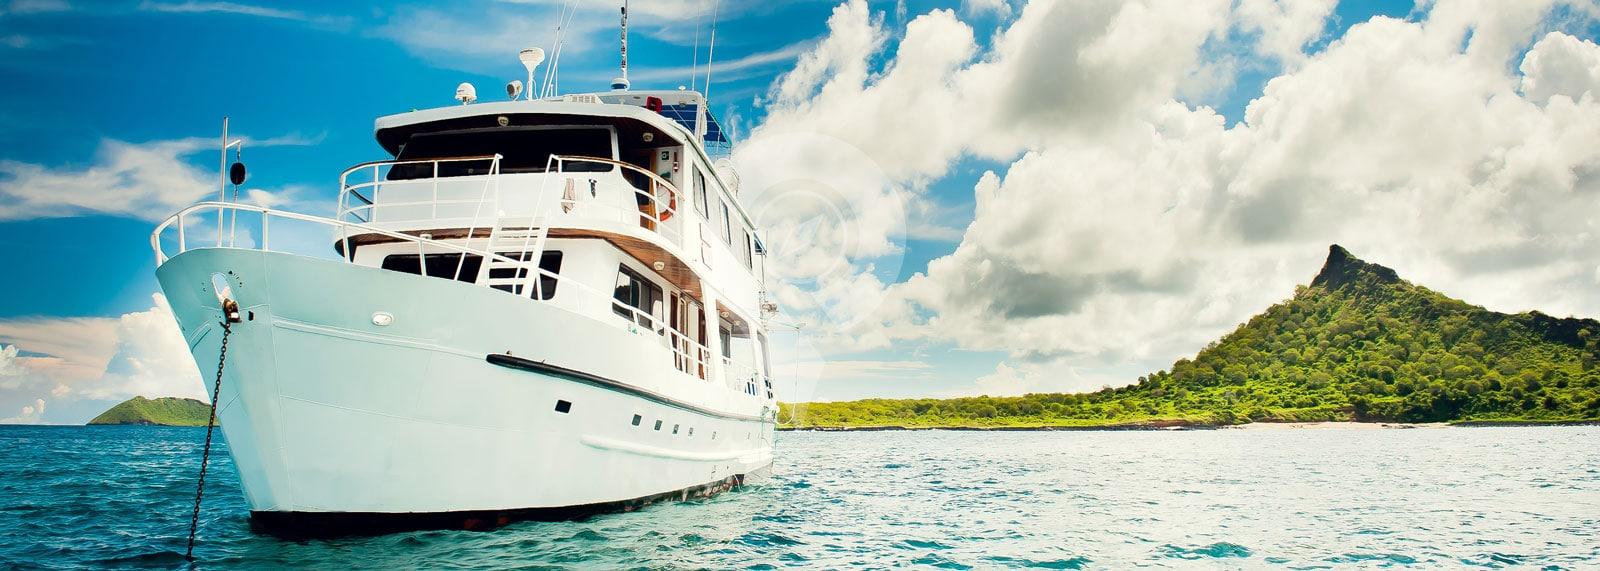 Fragata Galapagos Yacht